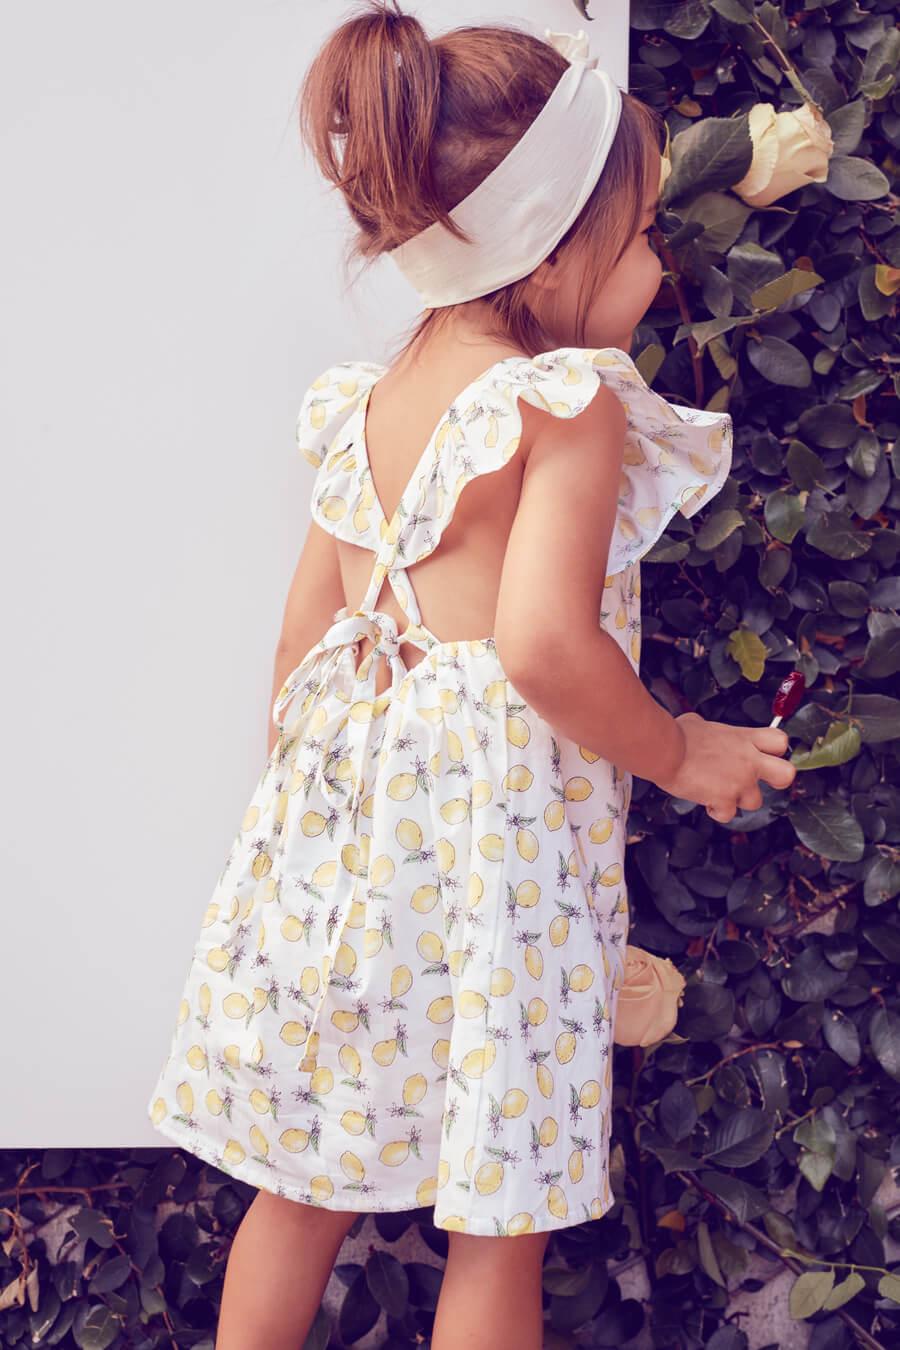 lil lemons